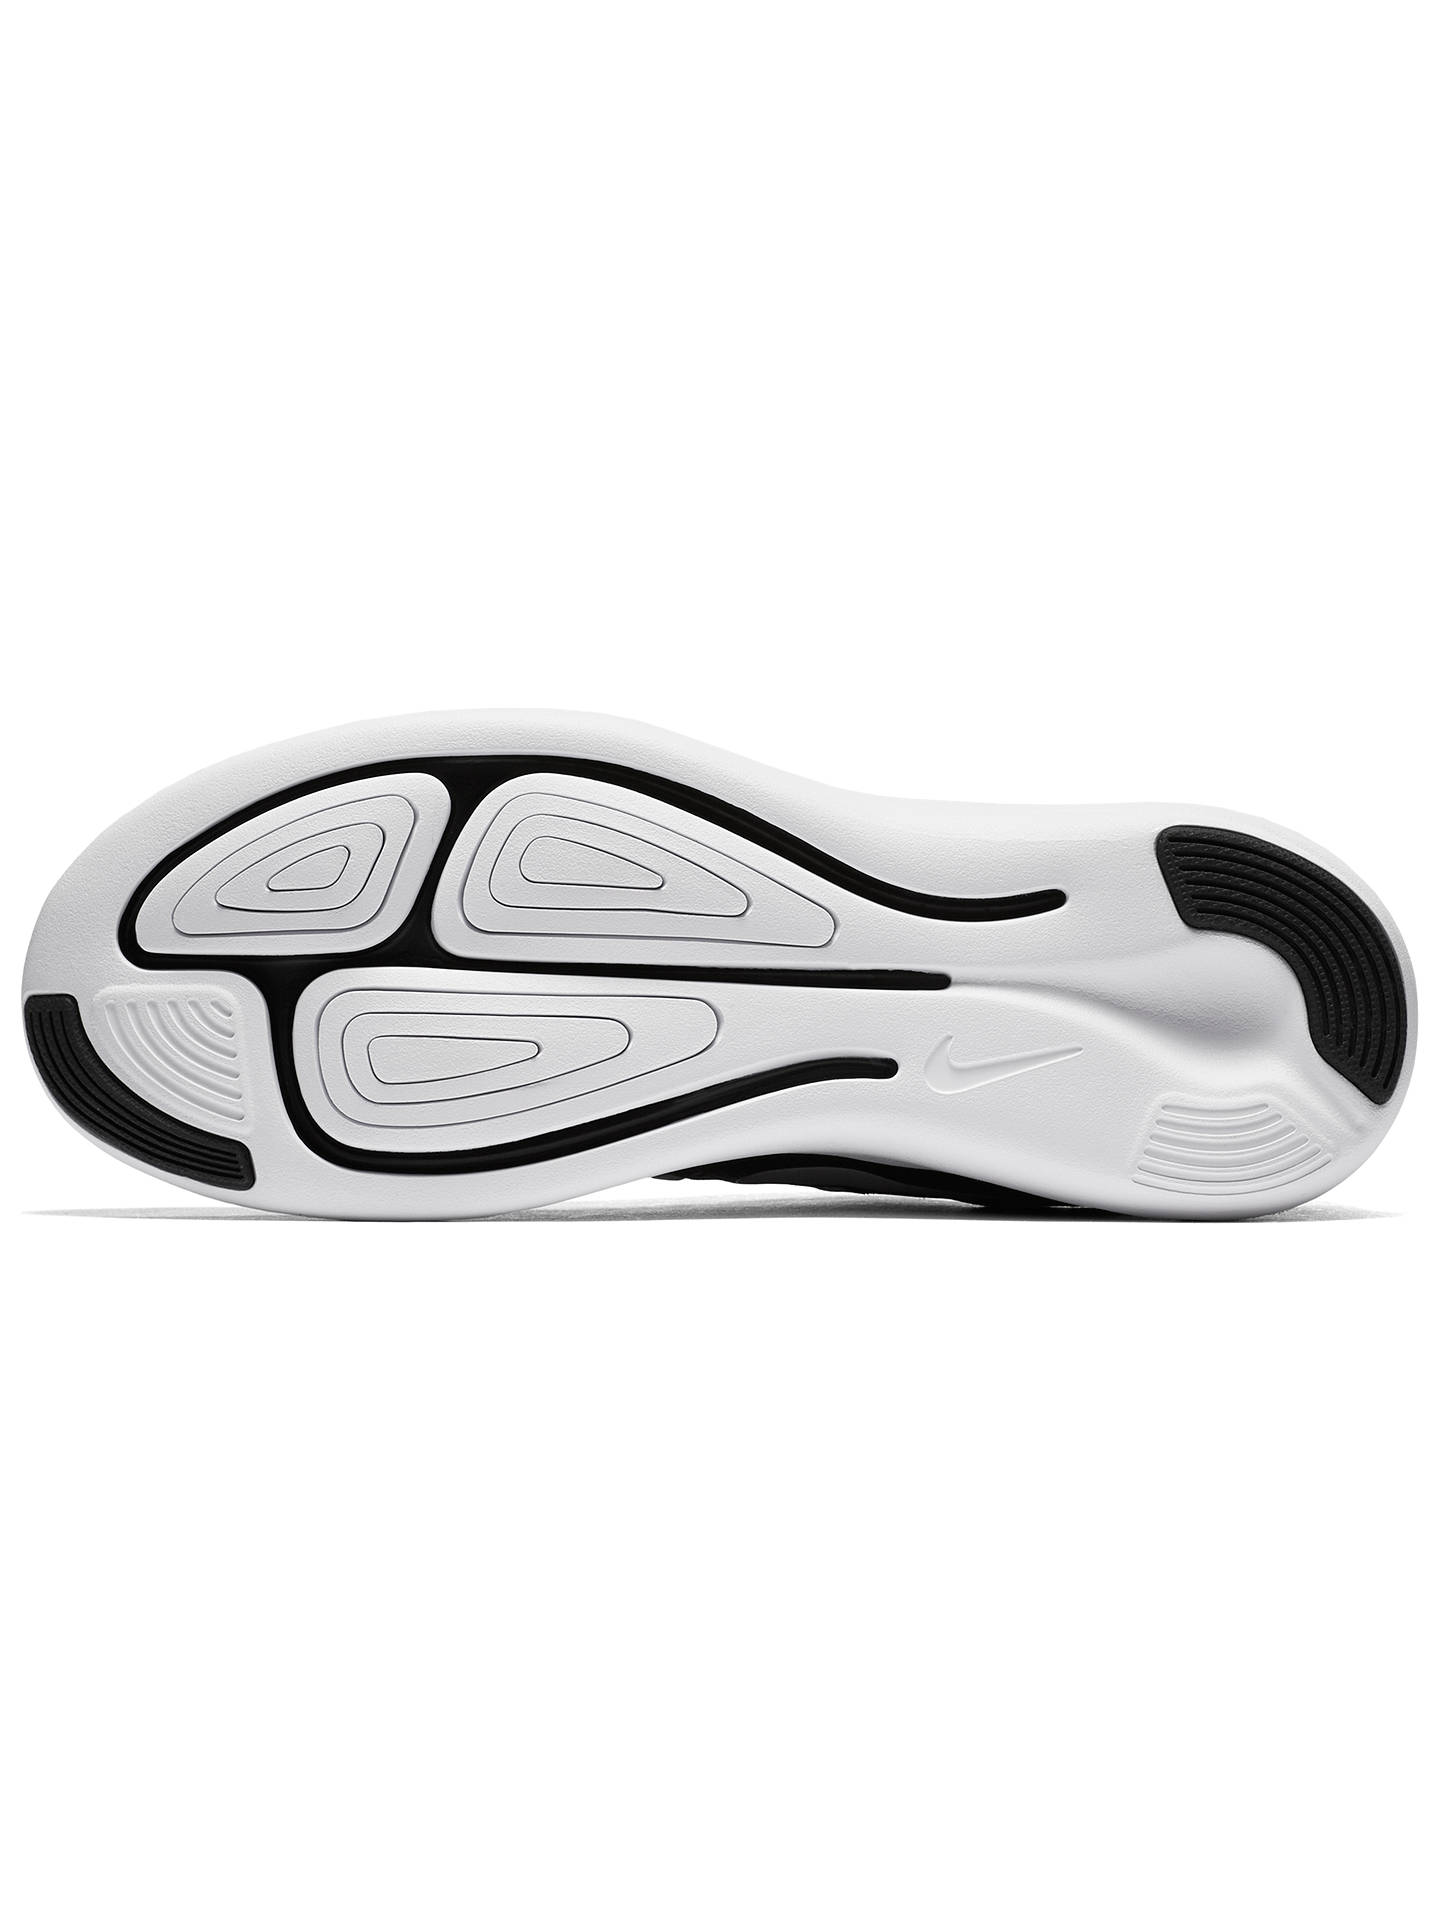 huge discount 1267d c81cf Buy Nike LunarStelos Women s Running Shoes, Black Anthracite, 4 Online at  johnlewis.